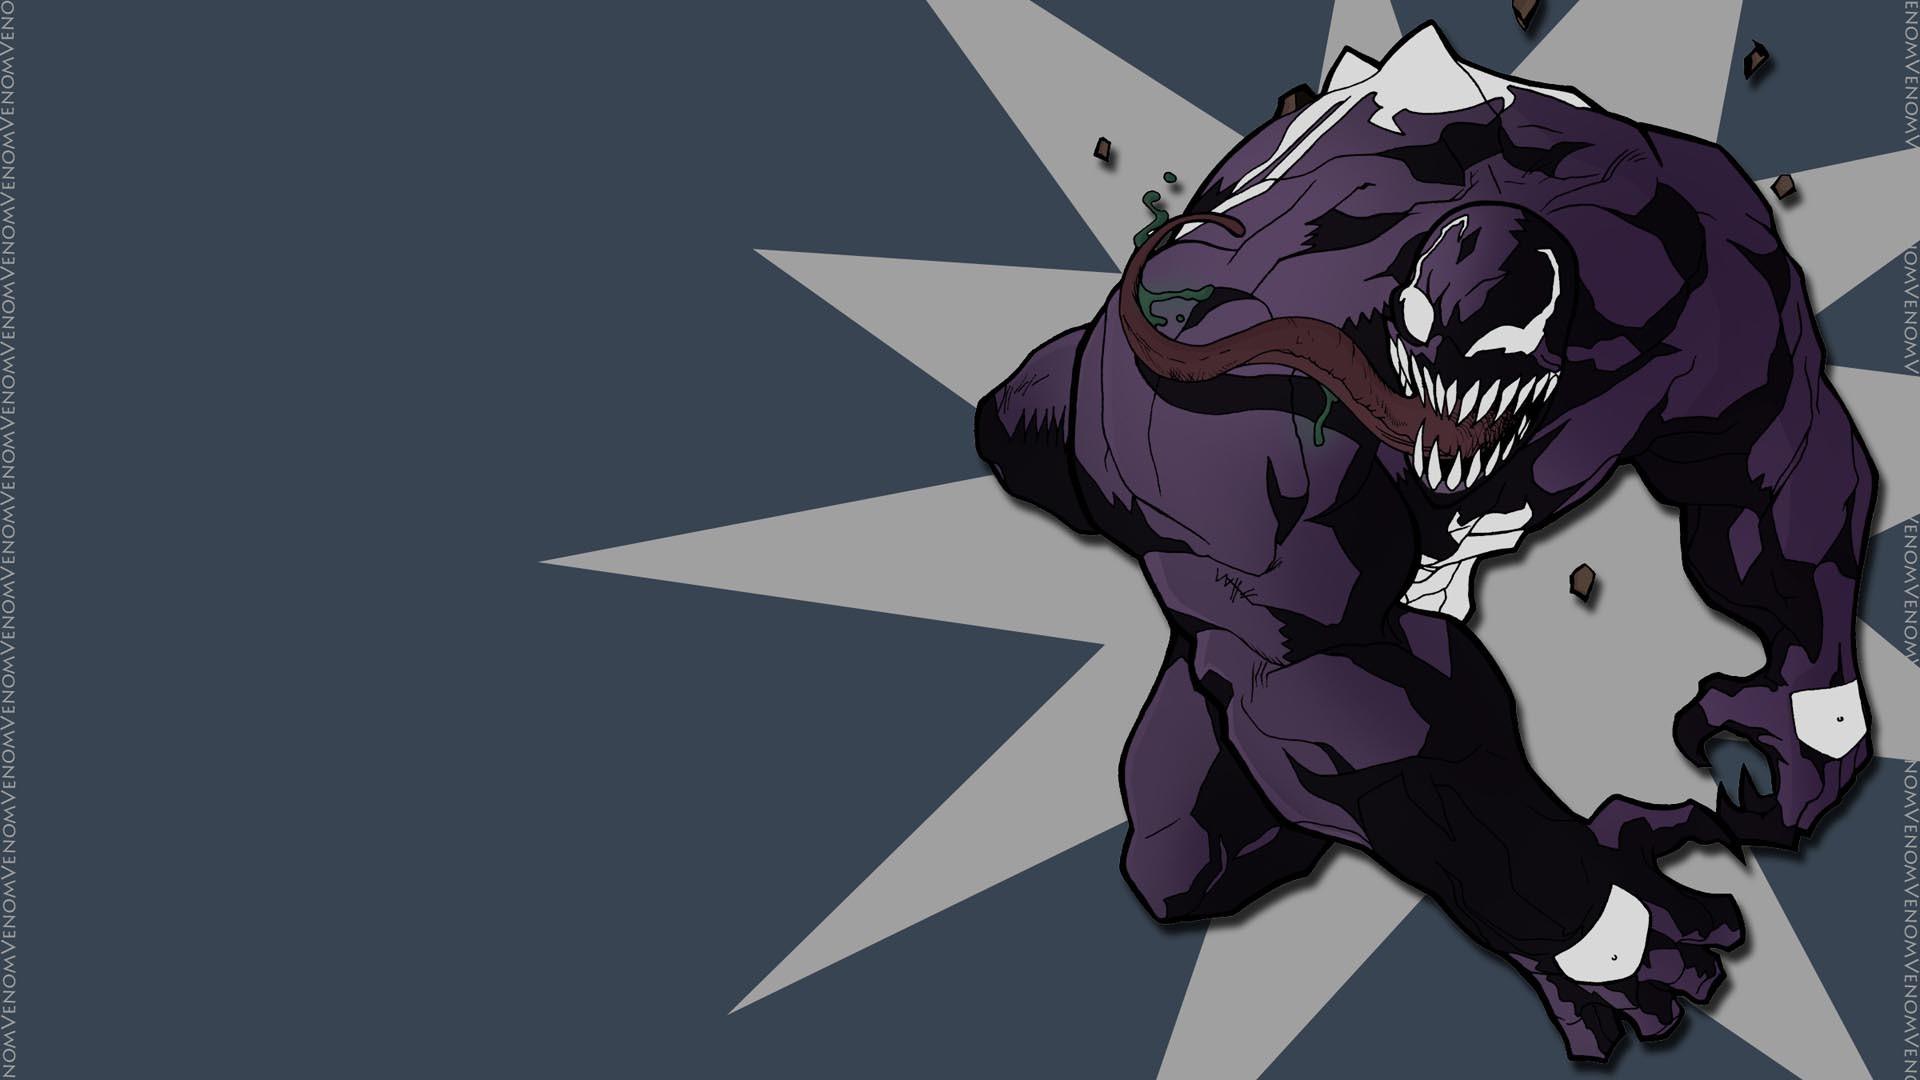 Venom wallpapers widescreen Venom Comic Wallpaper Hd